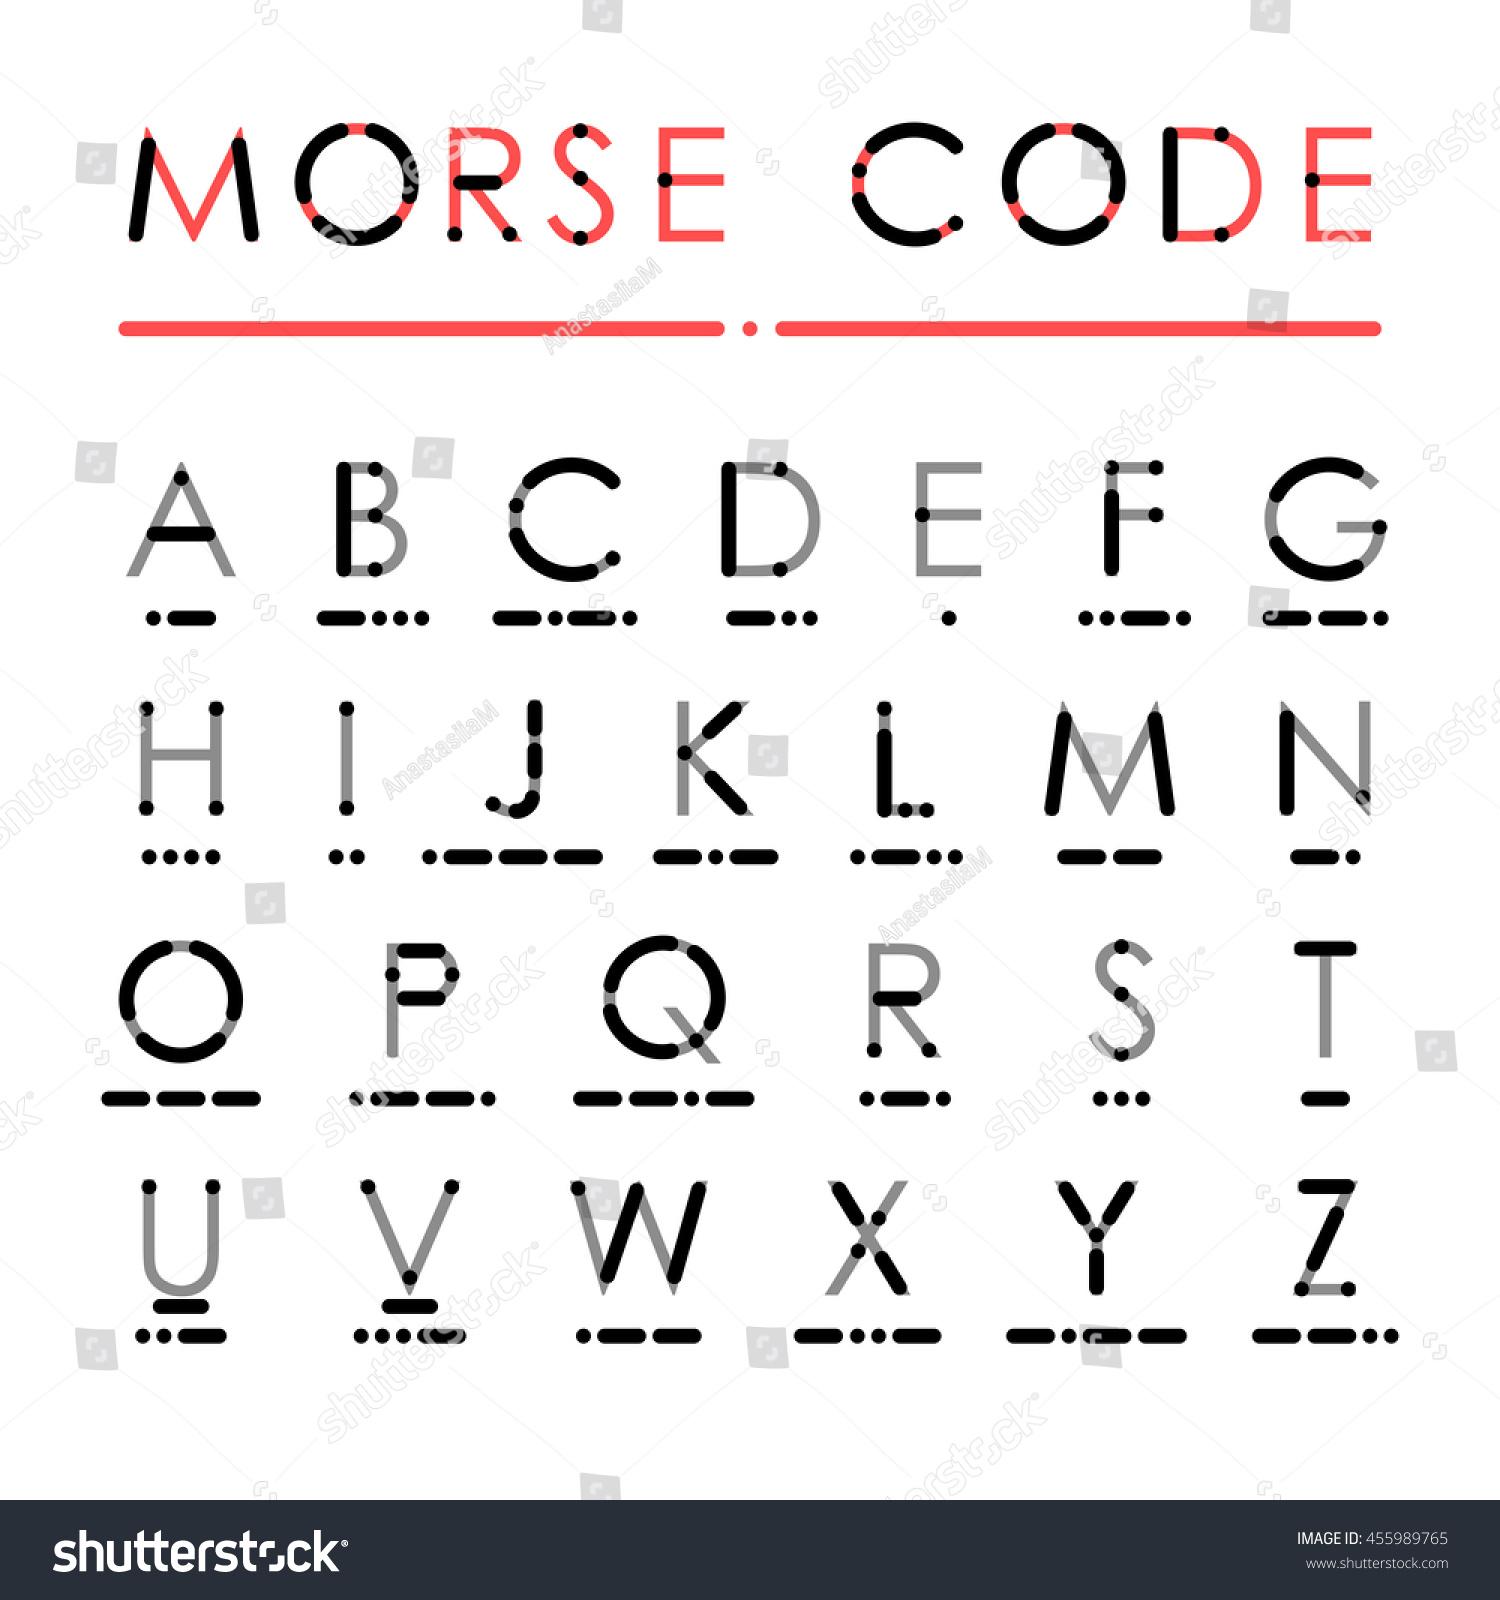 Latin Alphabet In International Morse Code Visual